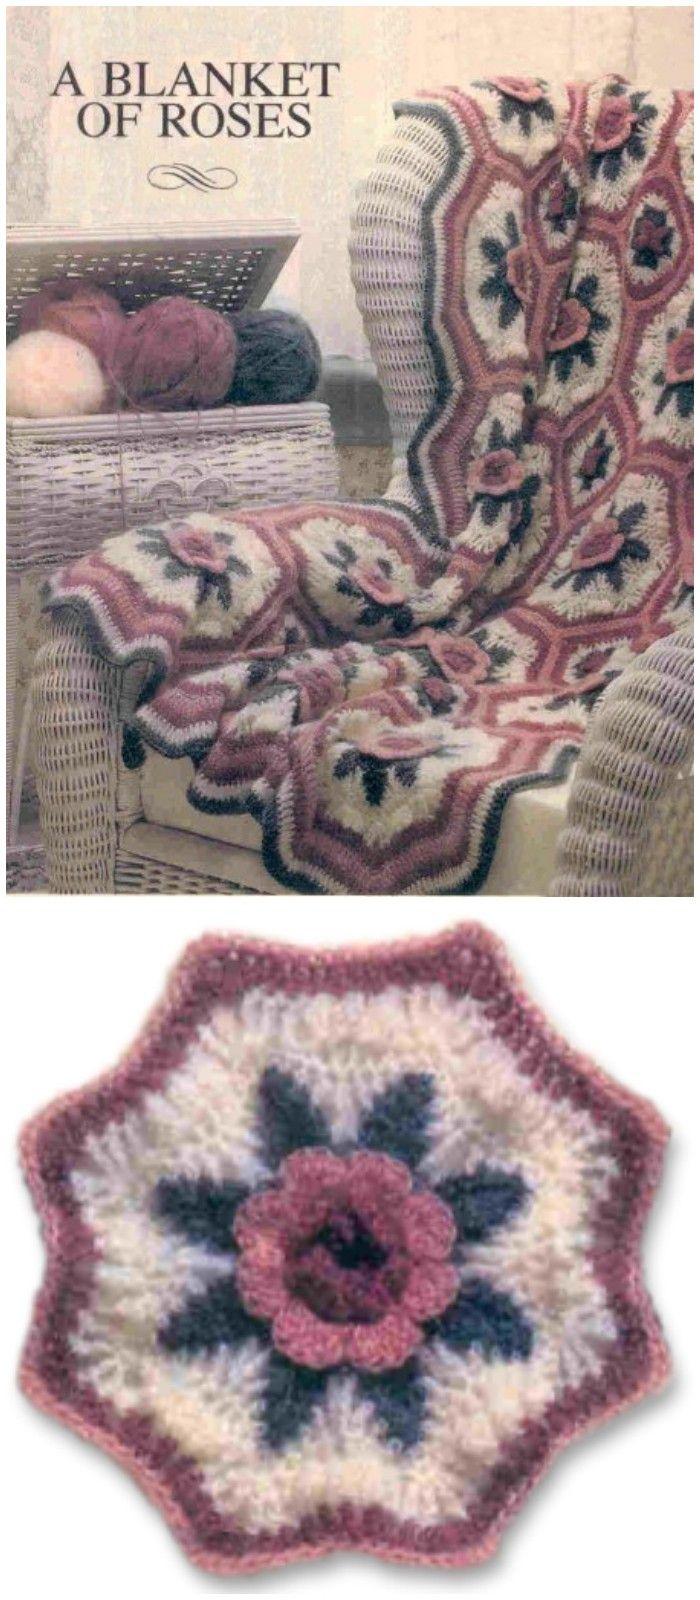 EASY Afghan Crochet Pattern \u2022 Vintage 1970s FLOWER Crochet Pattern \u2022 Crochet a Flower Garden \u2022 Bohemian Home Decor \u2022 Watermarked PDF Only